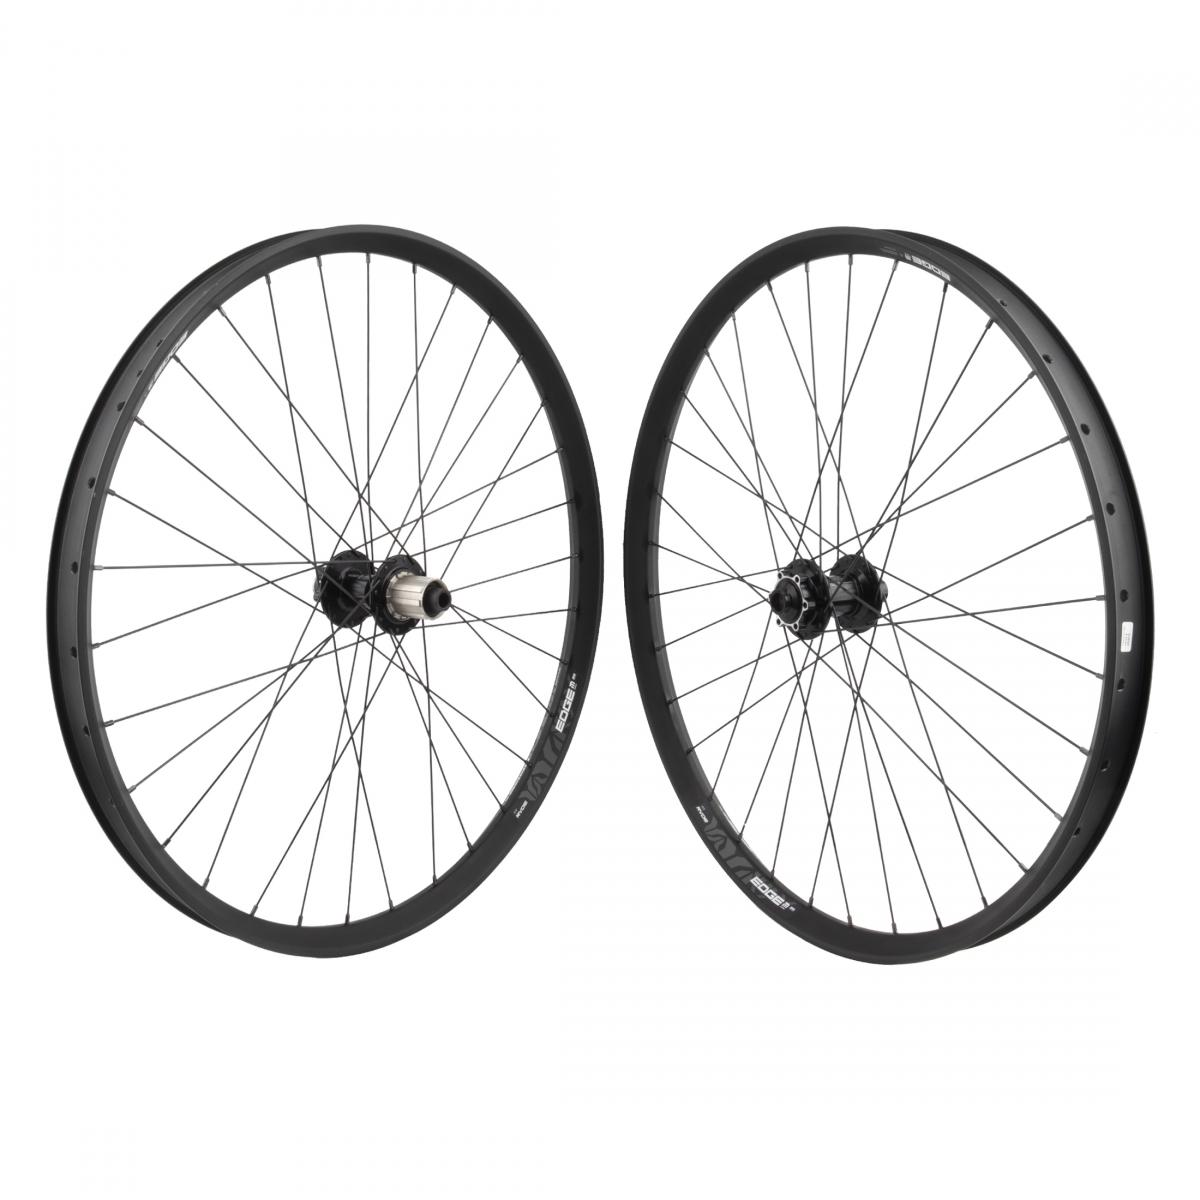 WM Wheels 27x1 630x14 Wei Lp18 Sl 36 Or8 Rd2100 Fw 5//6//7sp Qr Seal Sl 126mm Dti2